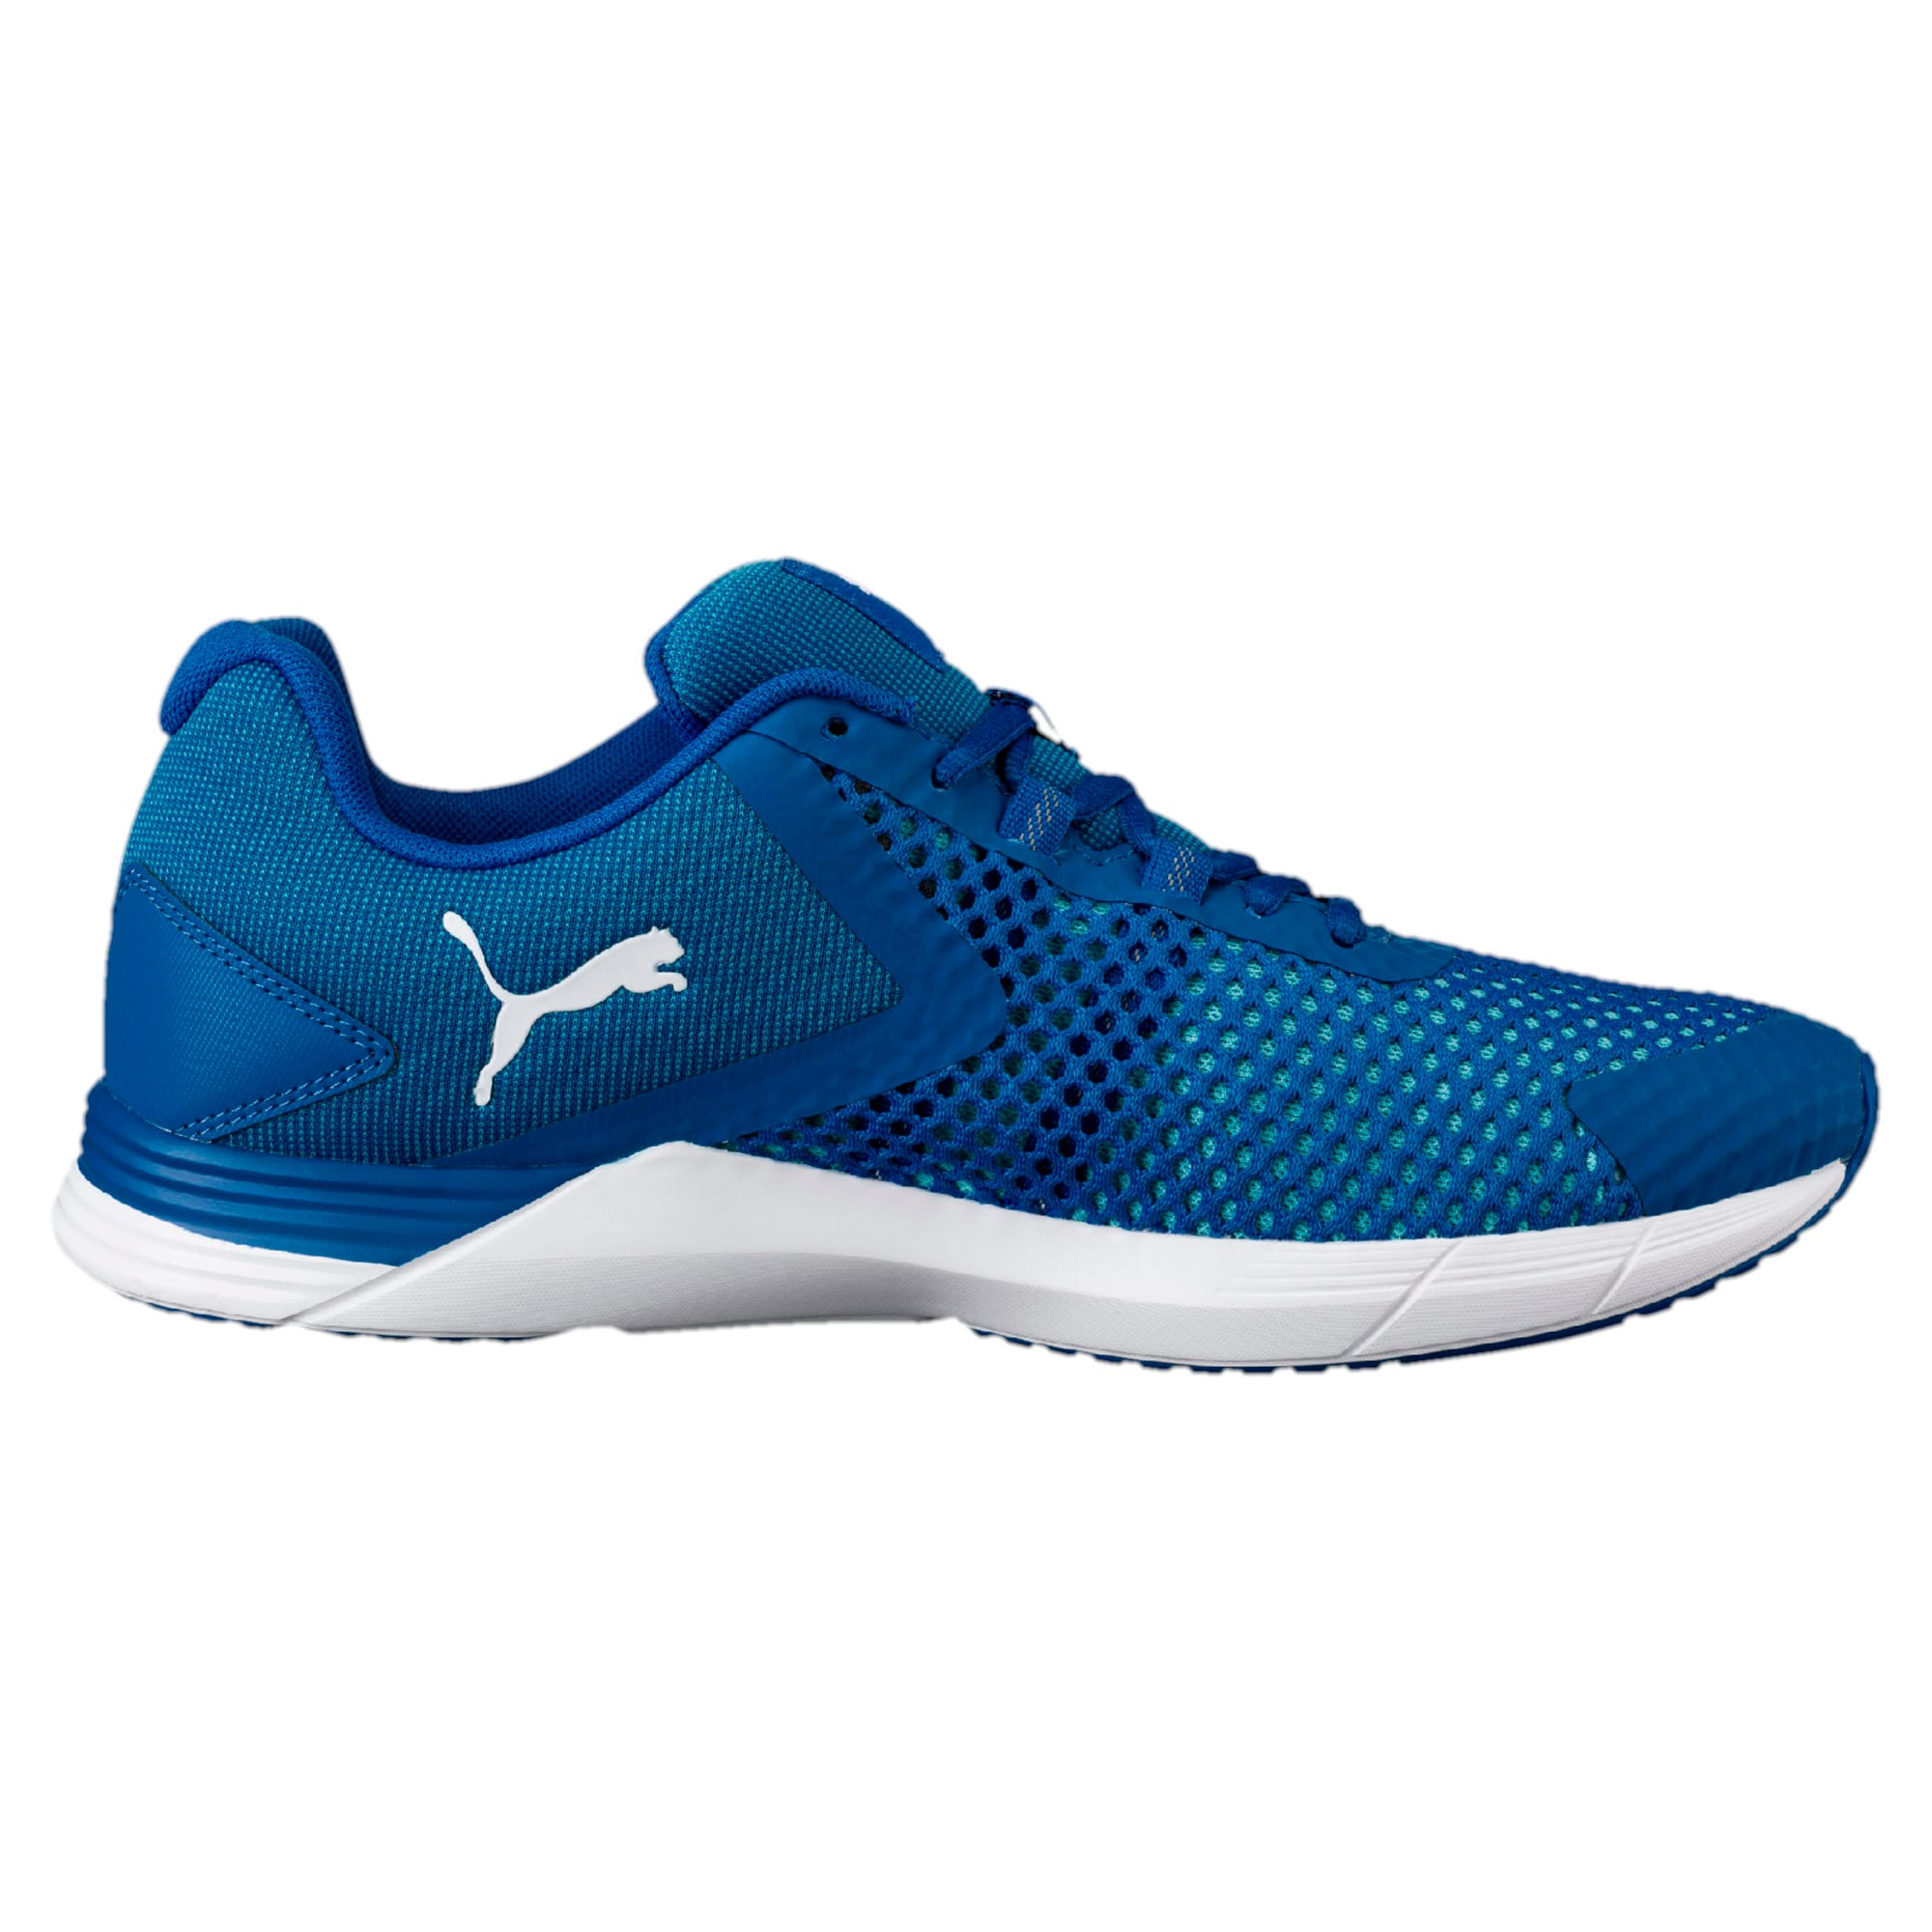 Thumbnail 5 of Propel 2 Men's Running Shoes, Lapis Blue-Turquoise-White, medium-IND